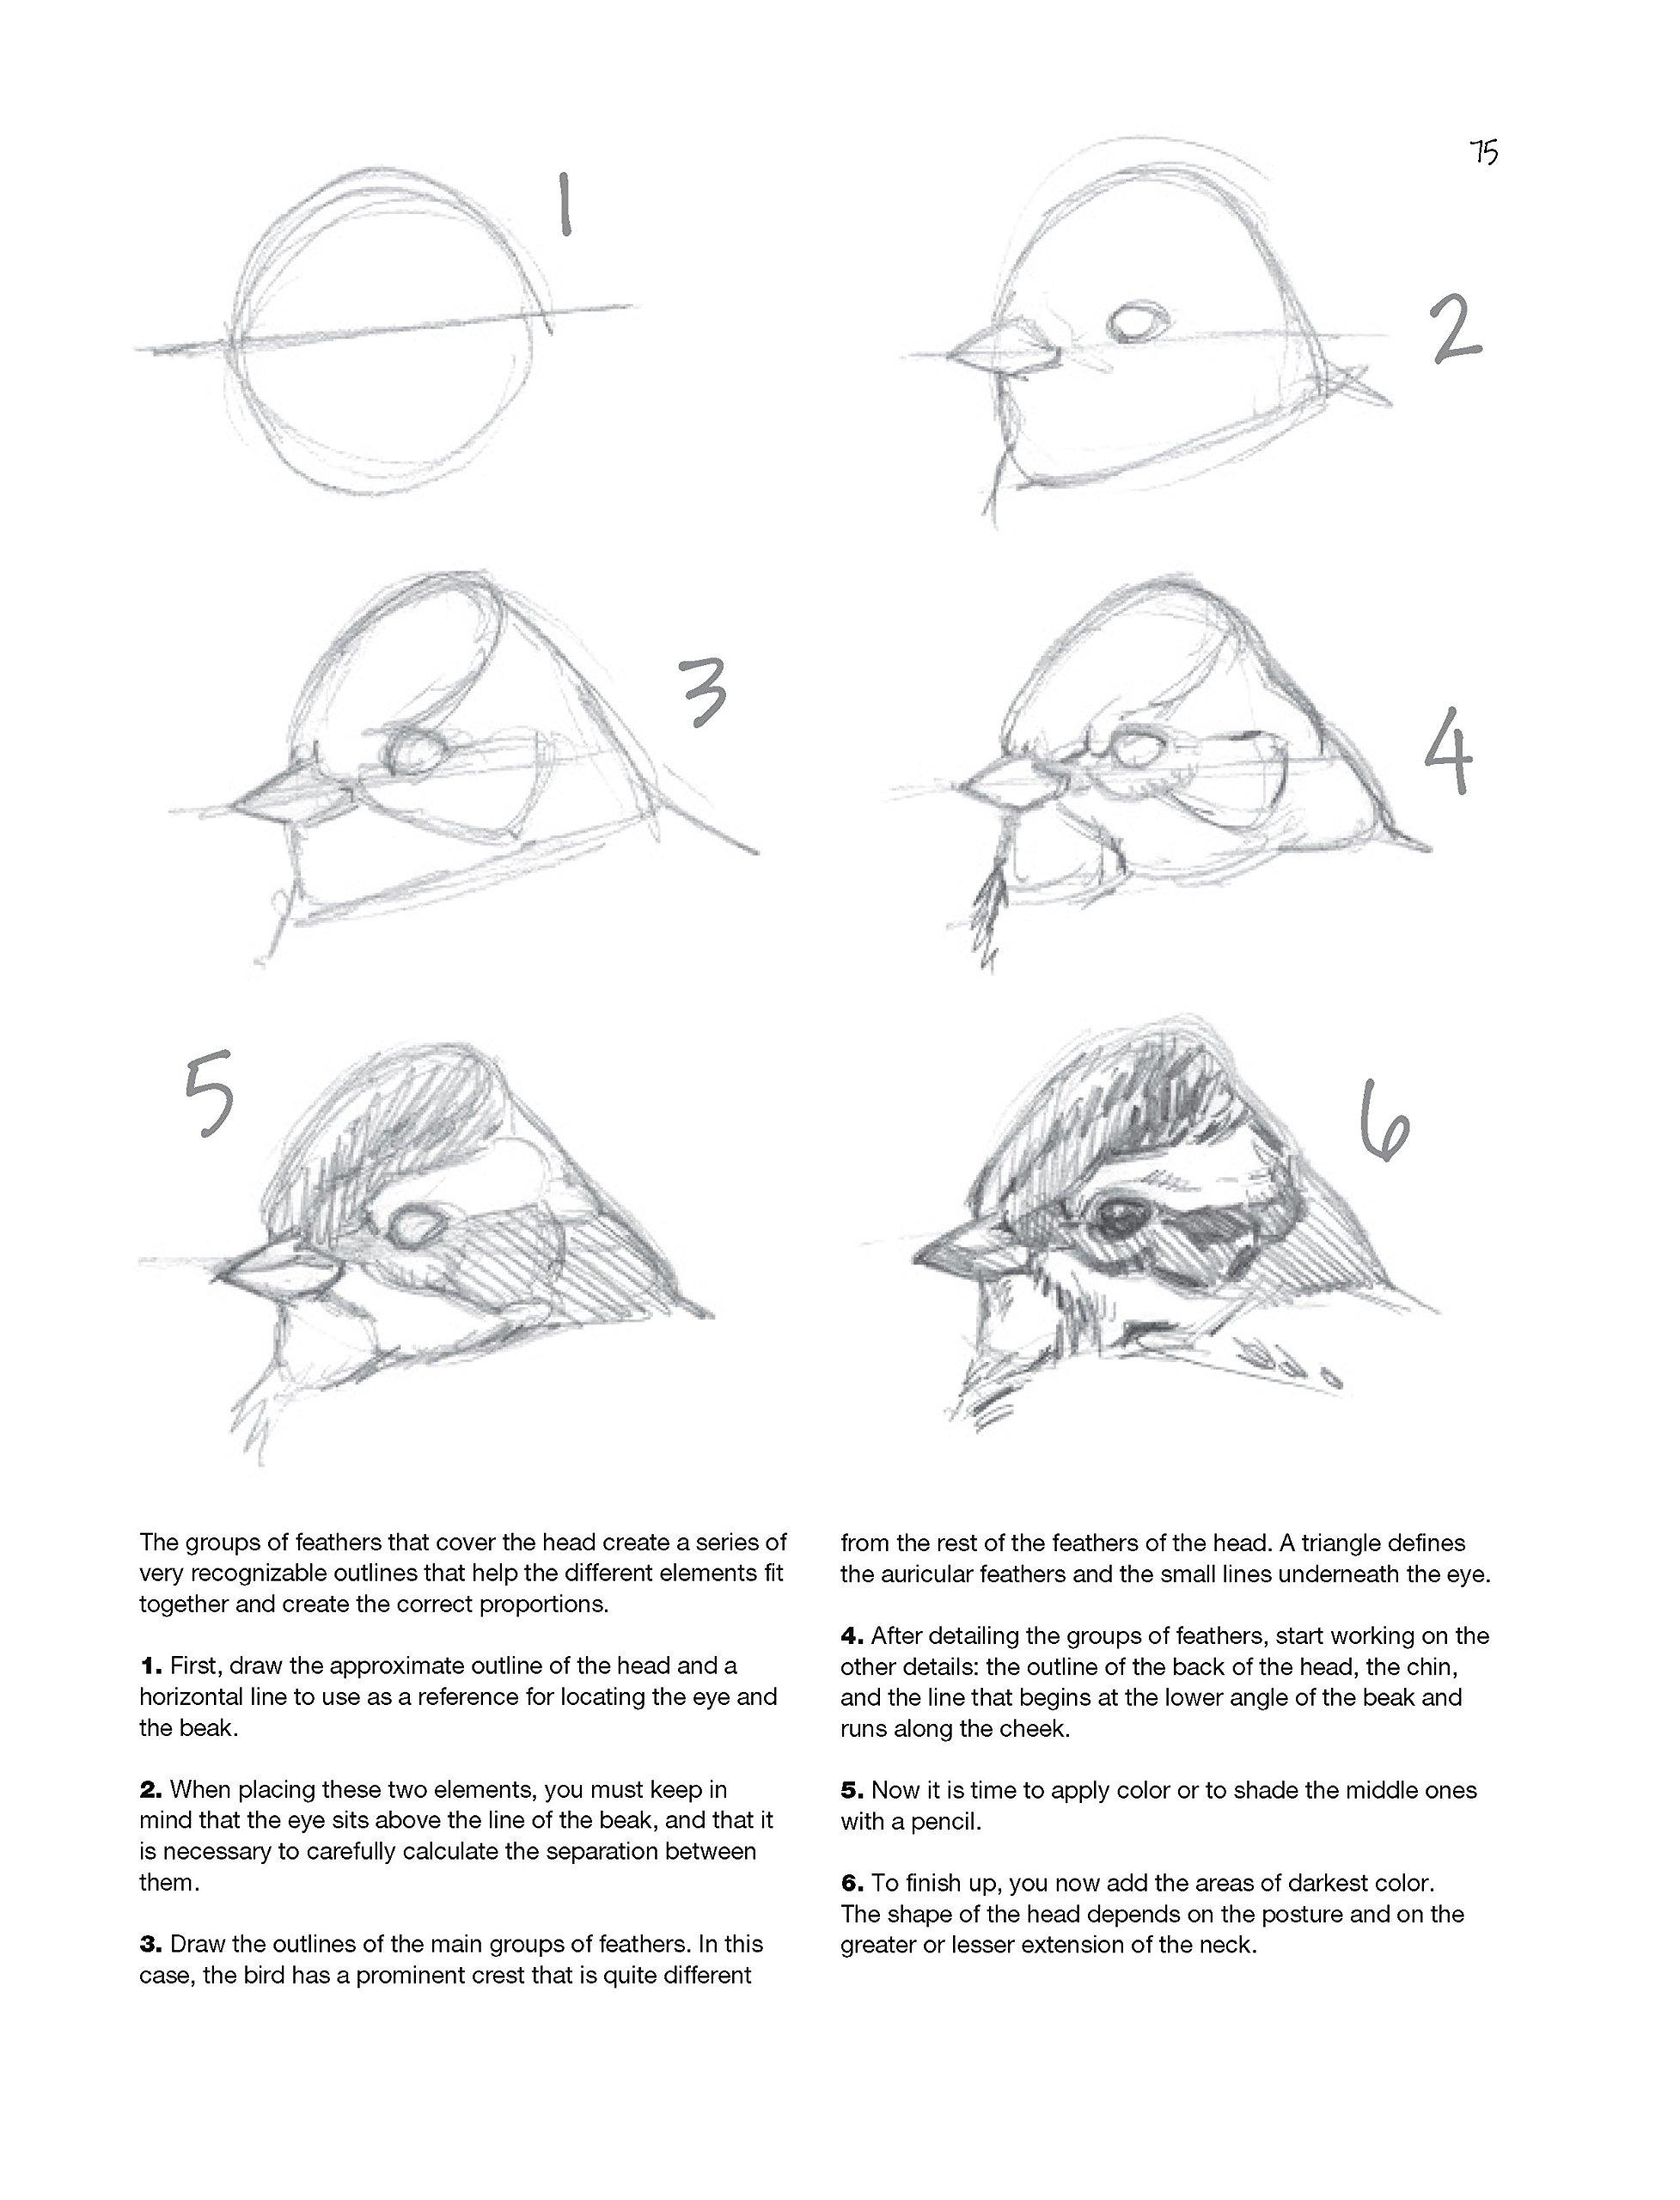 Sketching illustrating birds professional drawing class juan varela simó 9780764167911 amazon com books